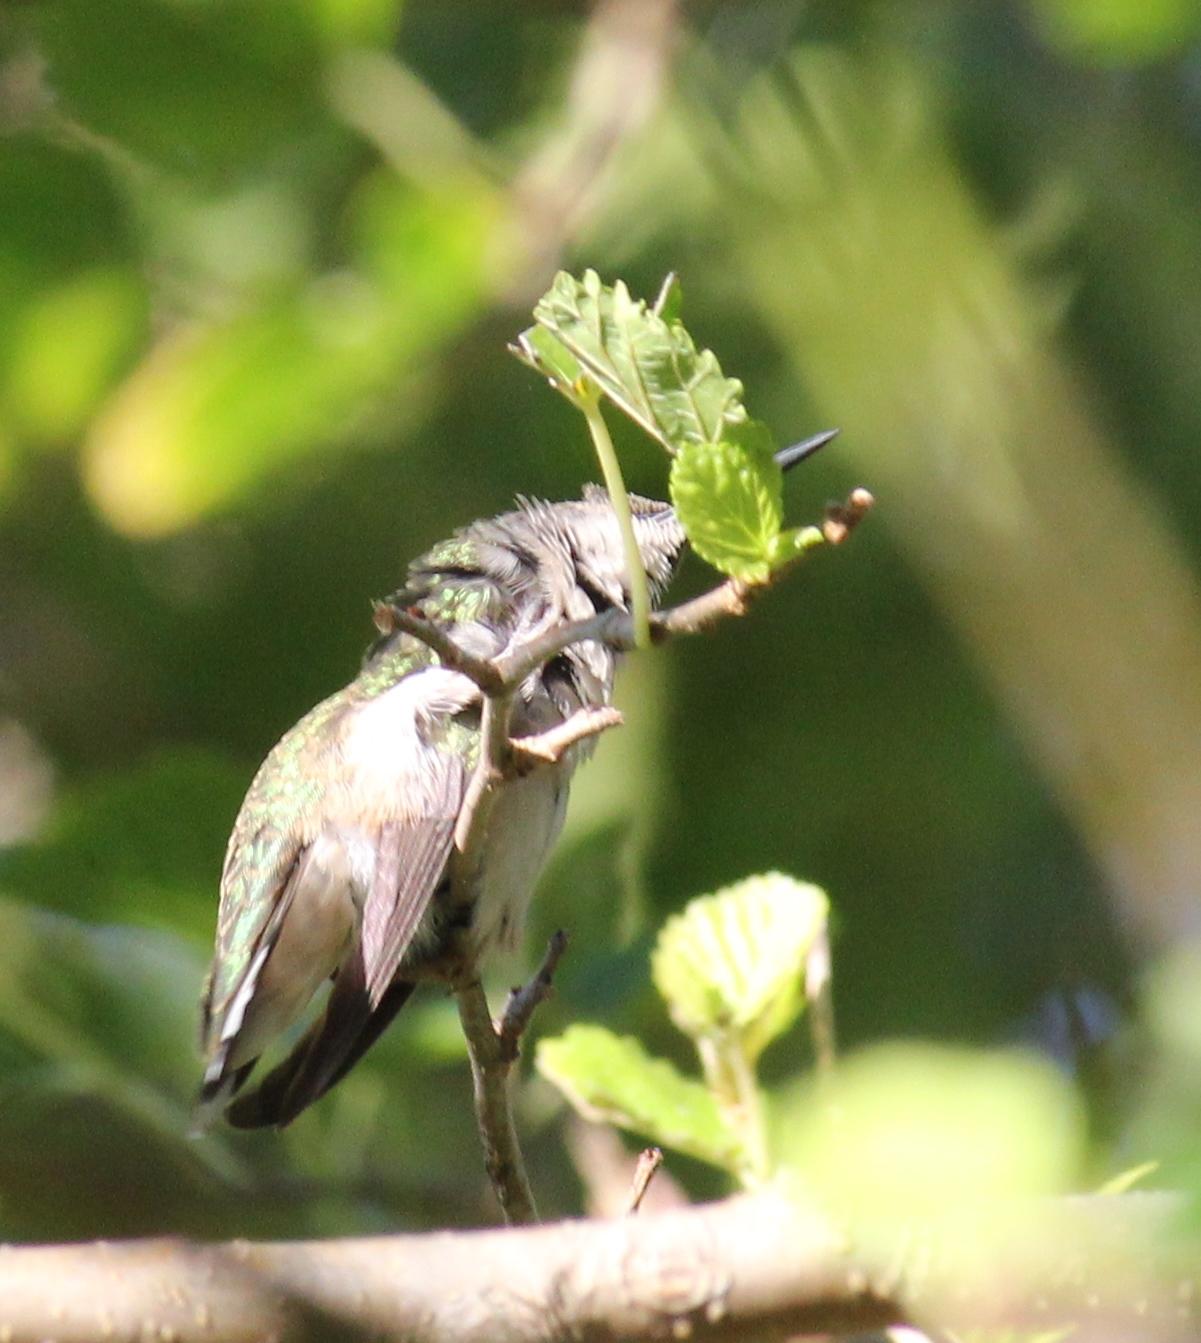 Ruby-throated hummingbird preening with foot